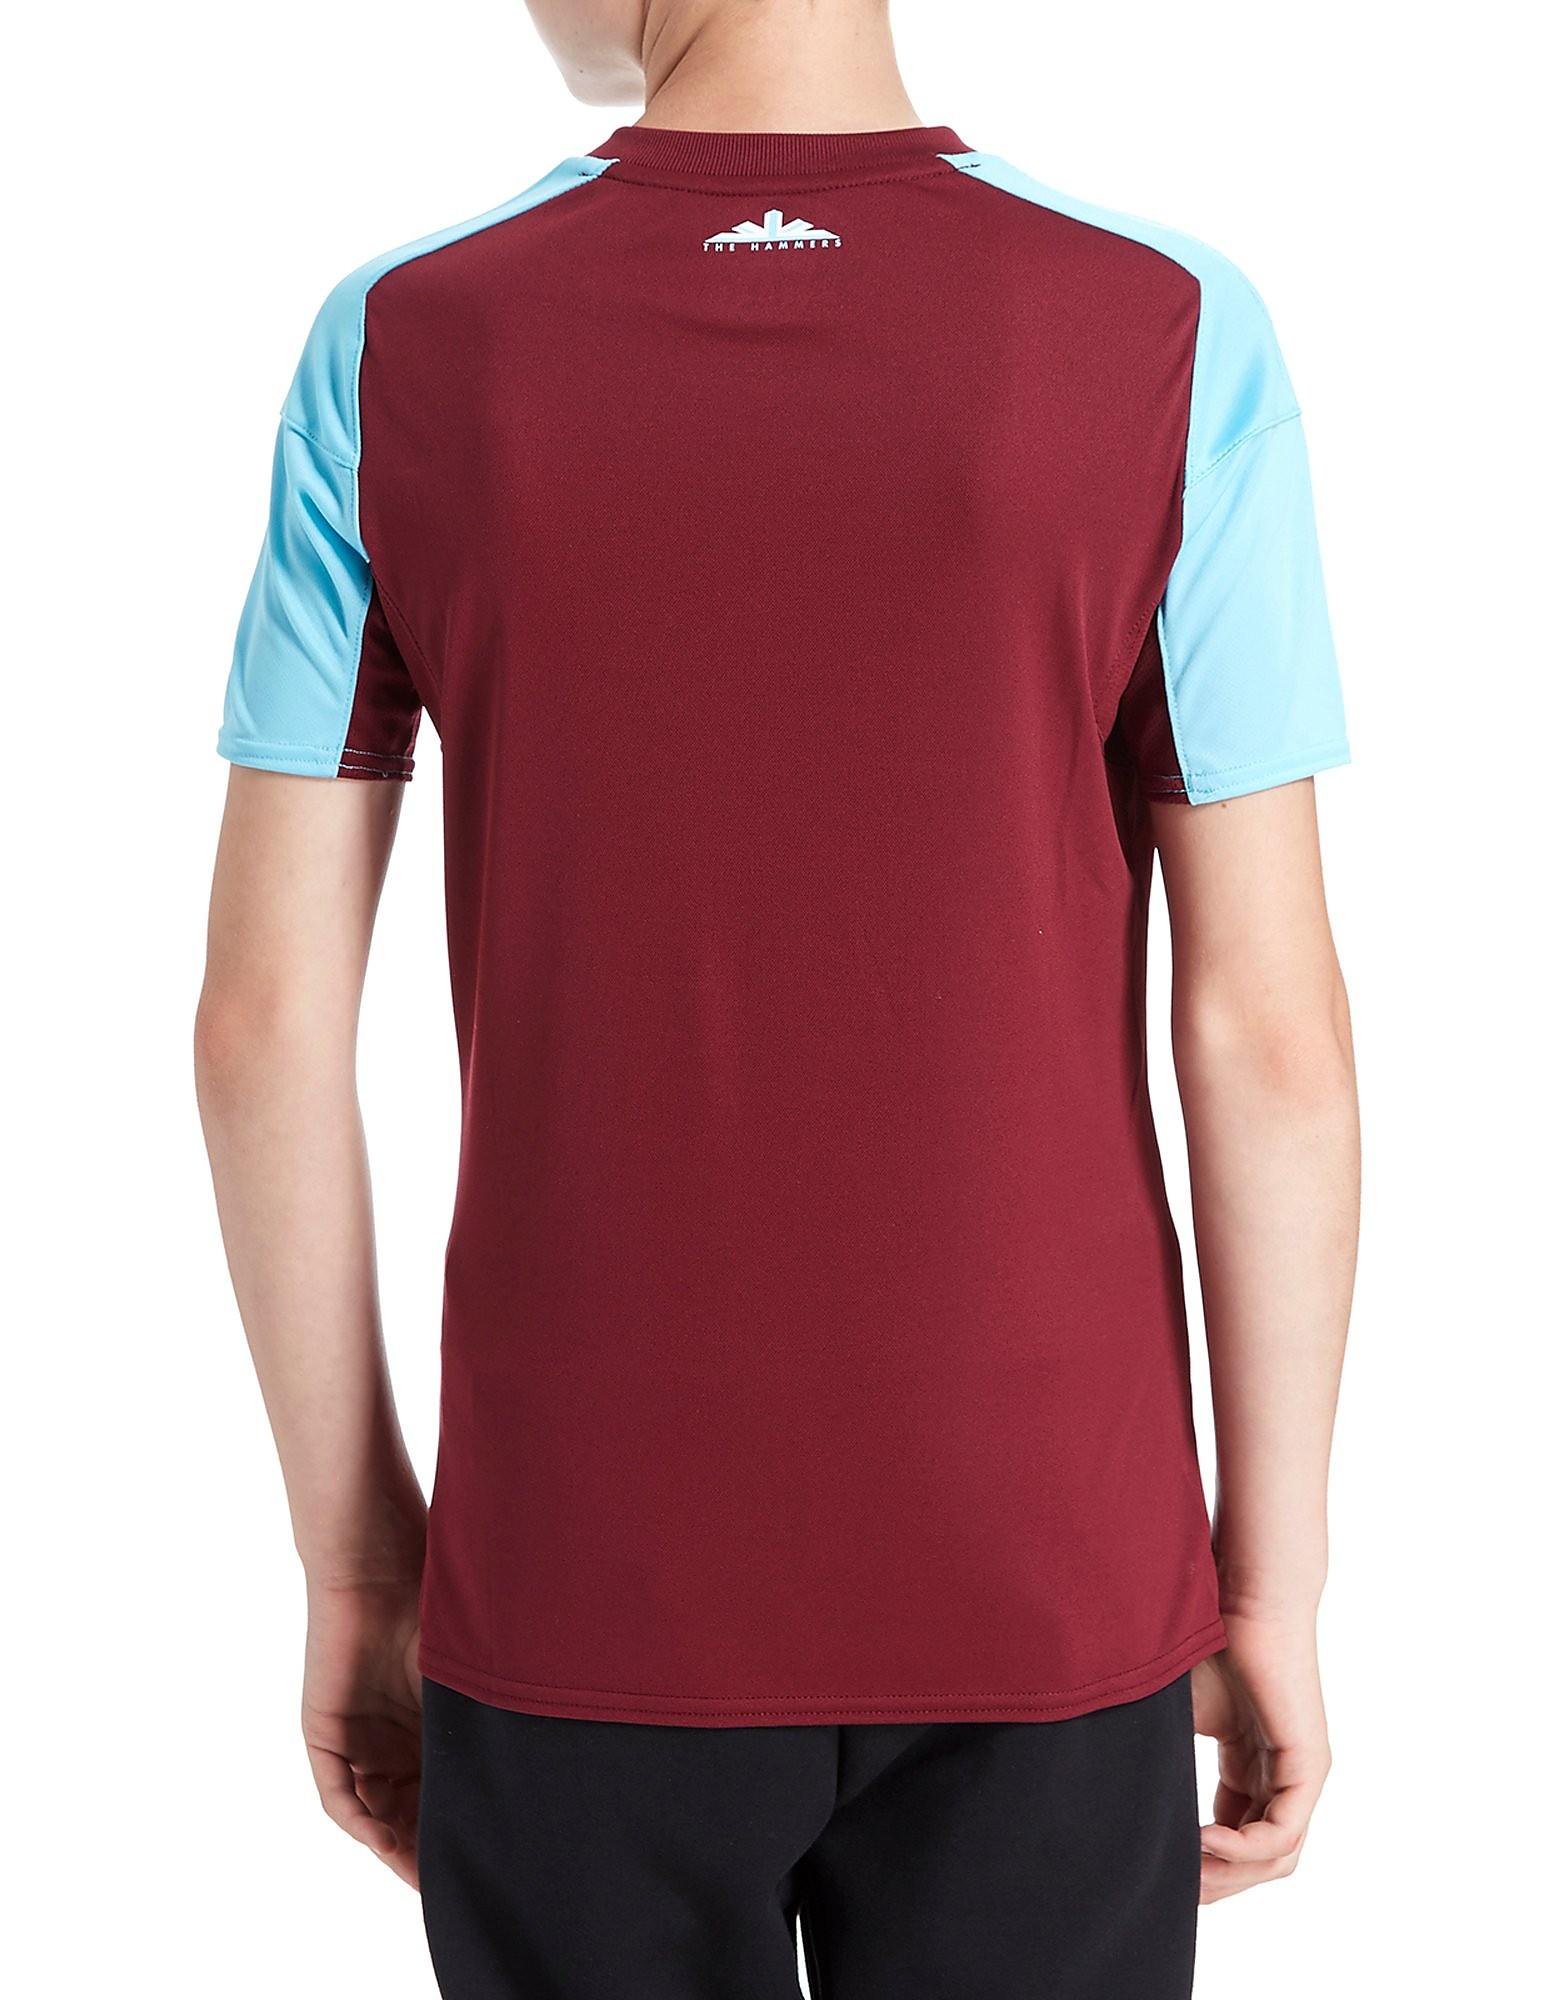 Umbro West Ham United 2017/18 Home Shirt Jnr PRE ORDER